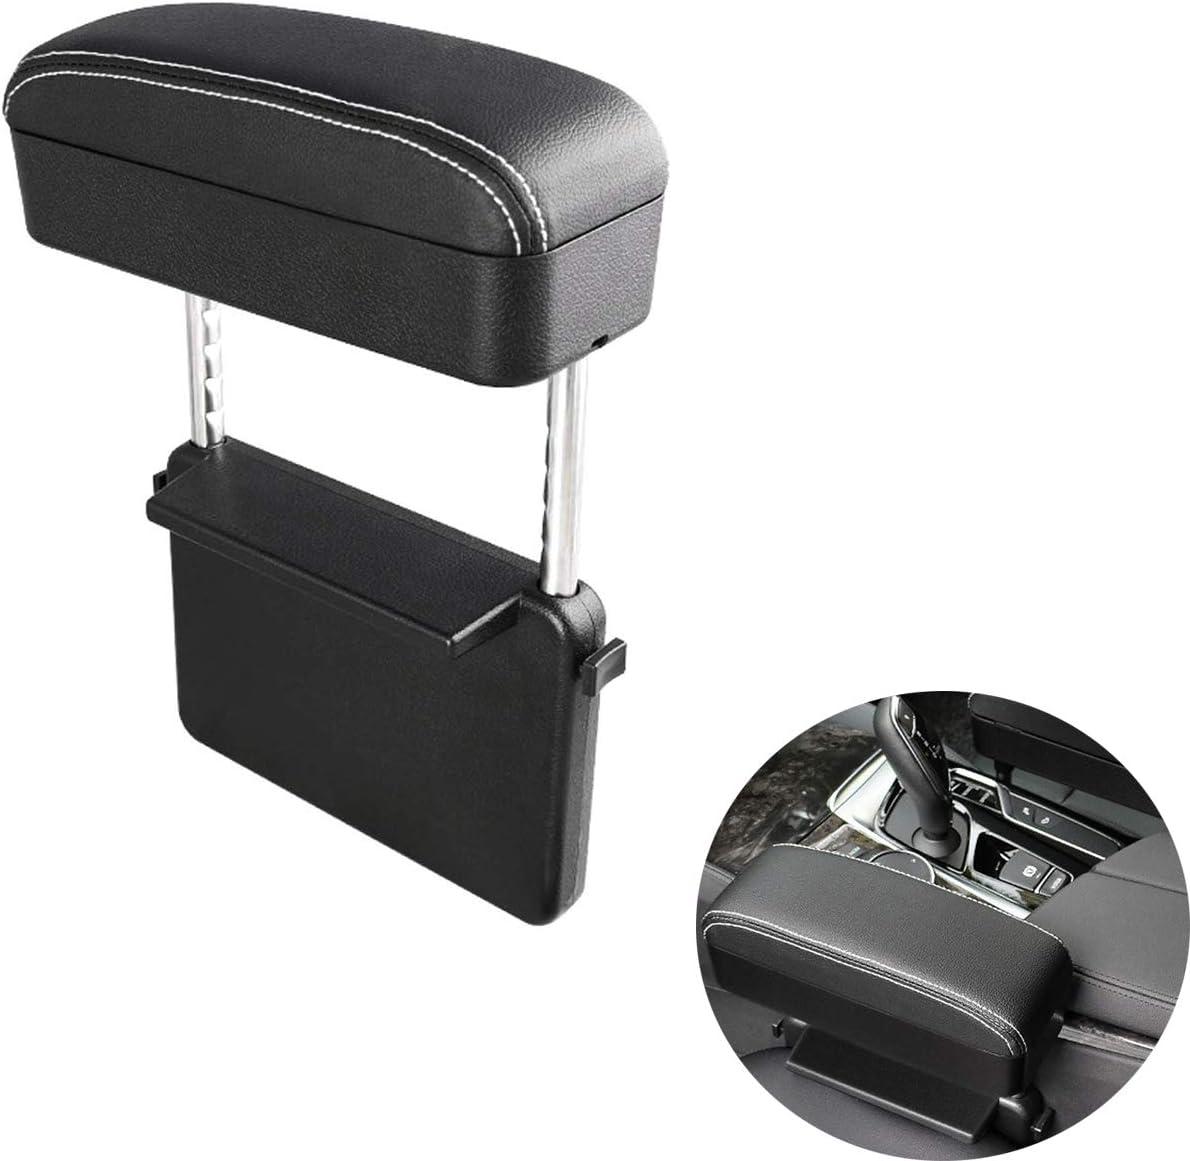 Storage RAYIE Universal Adjustable Car Armrex Box Sunglasses Coin etc Black- Red Line